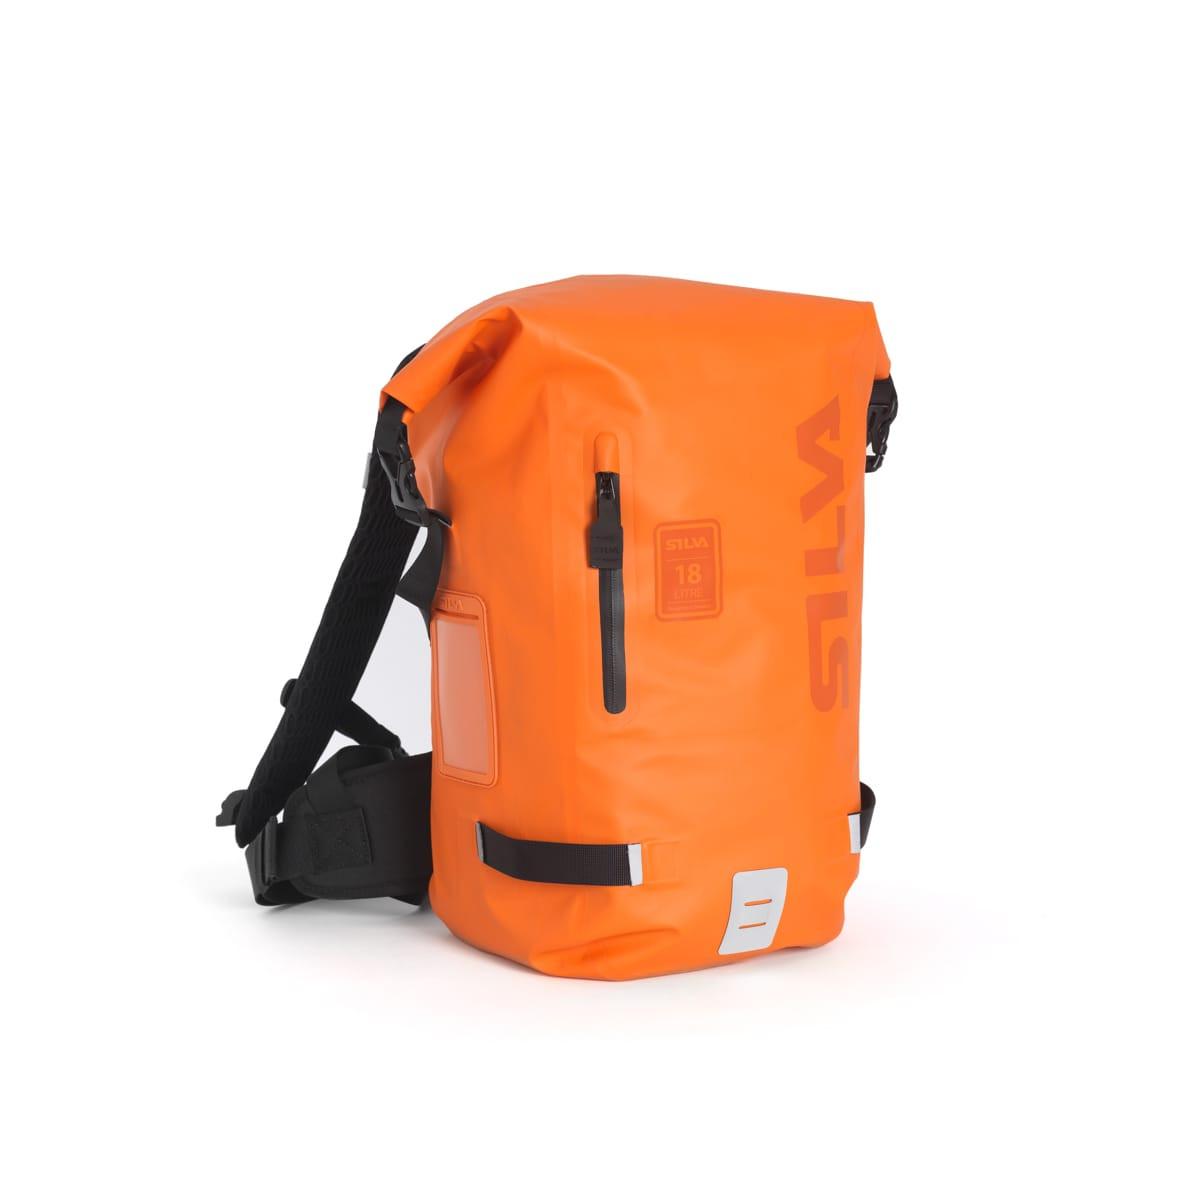 89f2d8e8 Silva Access 18wp Backpack-Orange Silva Access 18wp Backpack-Orange ...